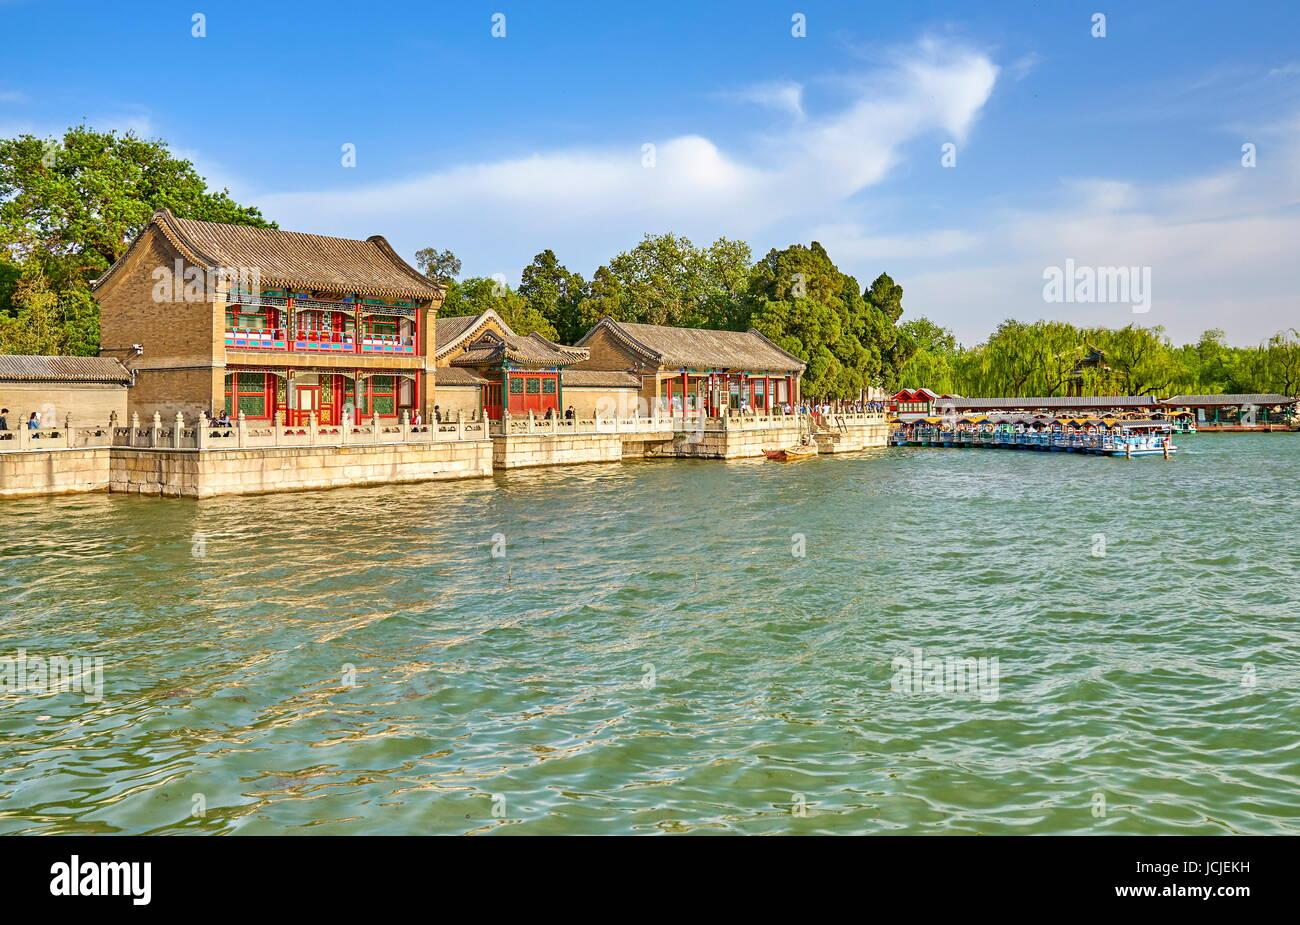 Kunming-See in der Nähe von Sommerpalast, Peking, China Stockbild